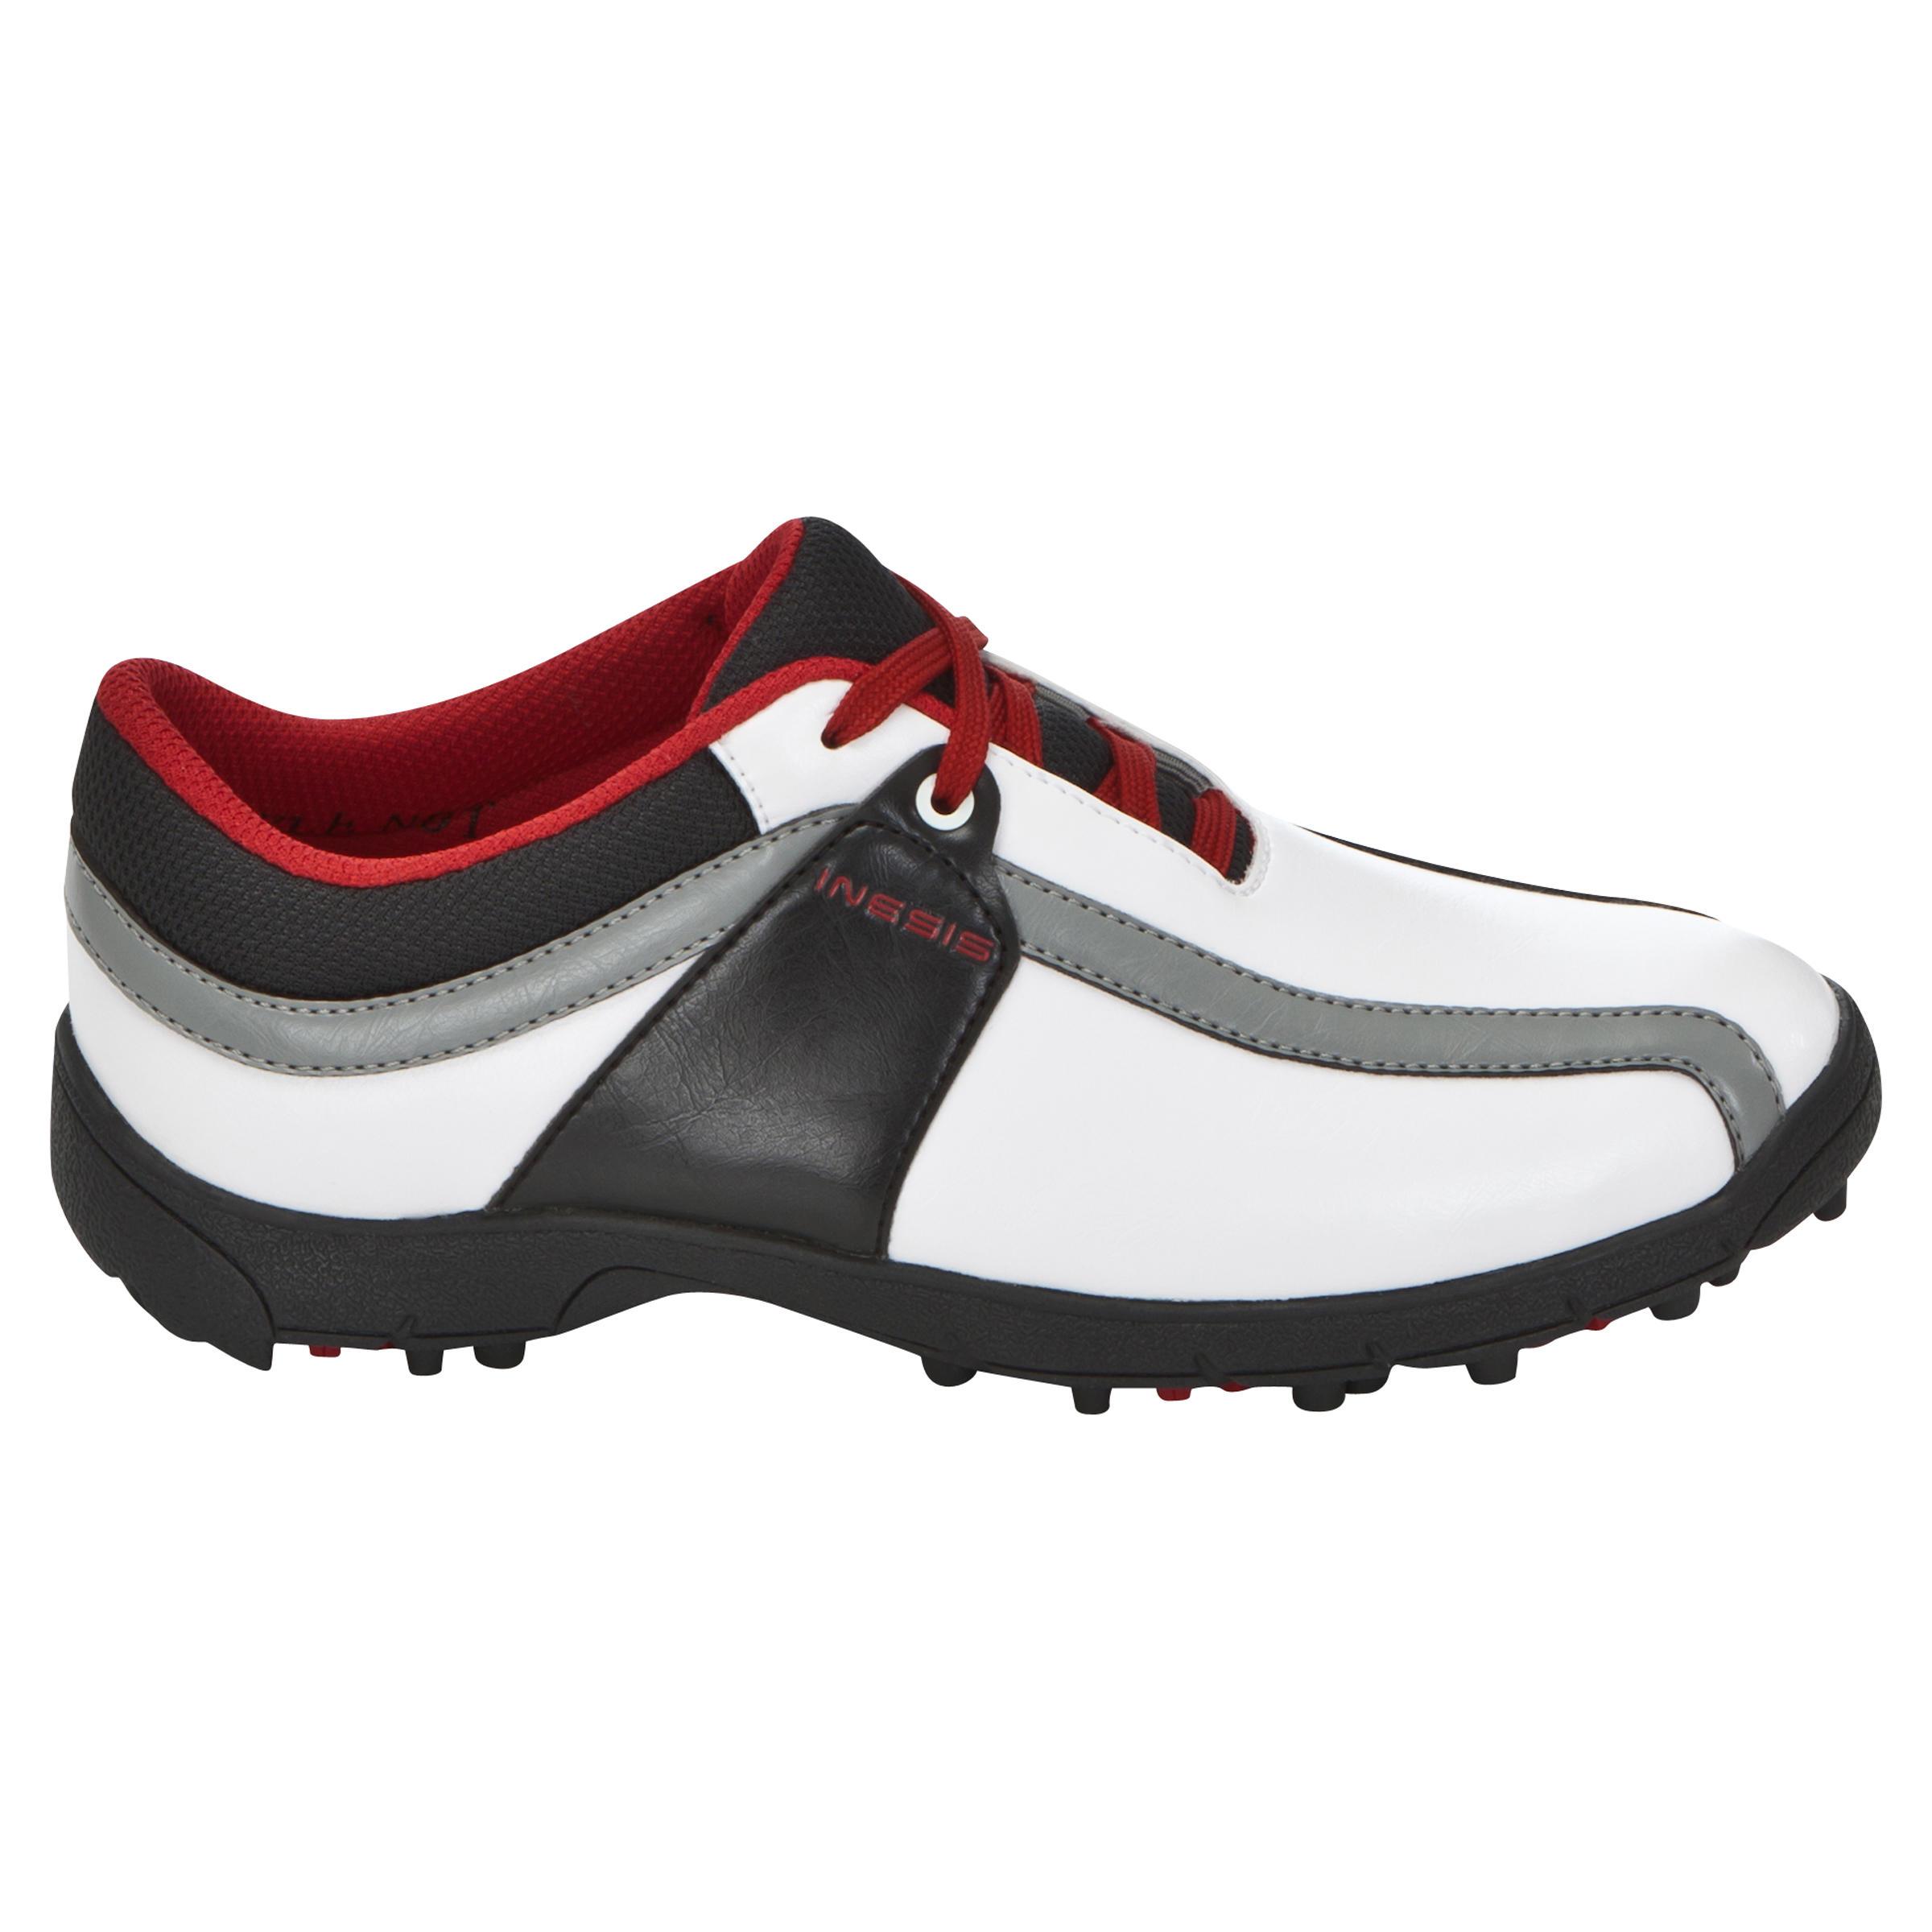 100 Kids Golf Shoes - White